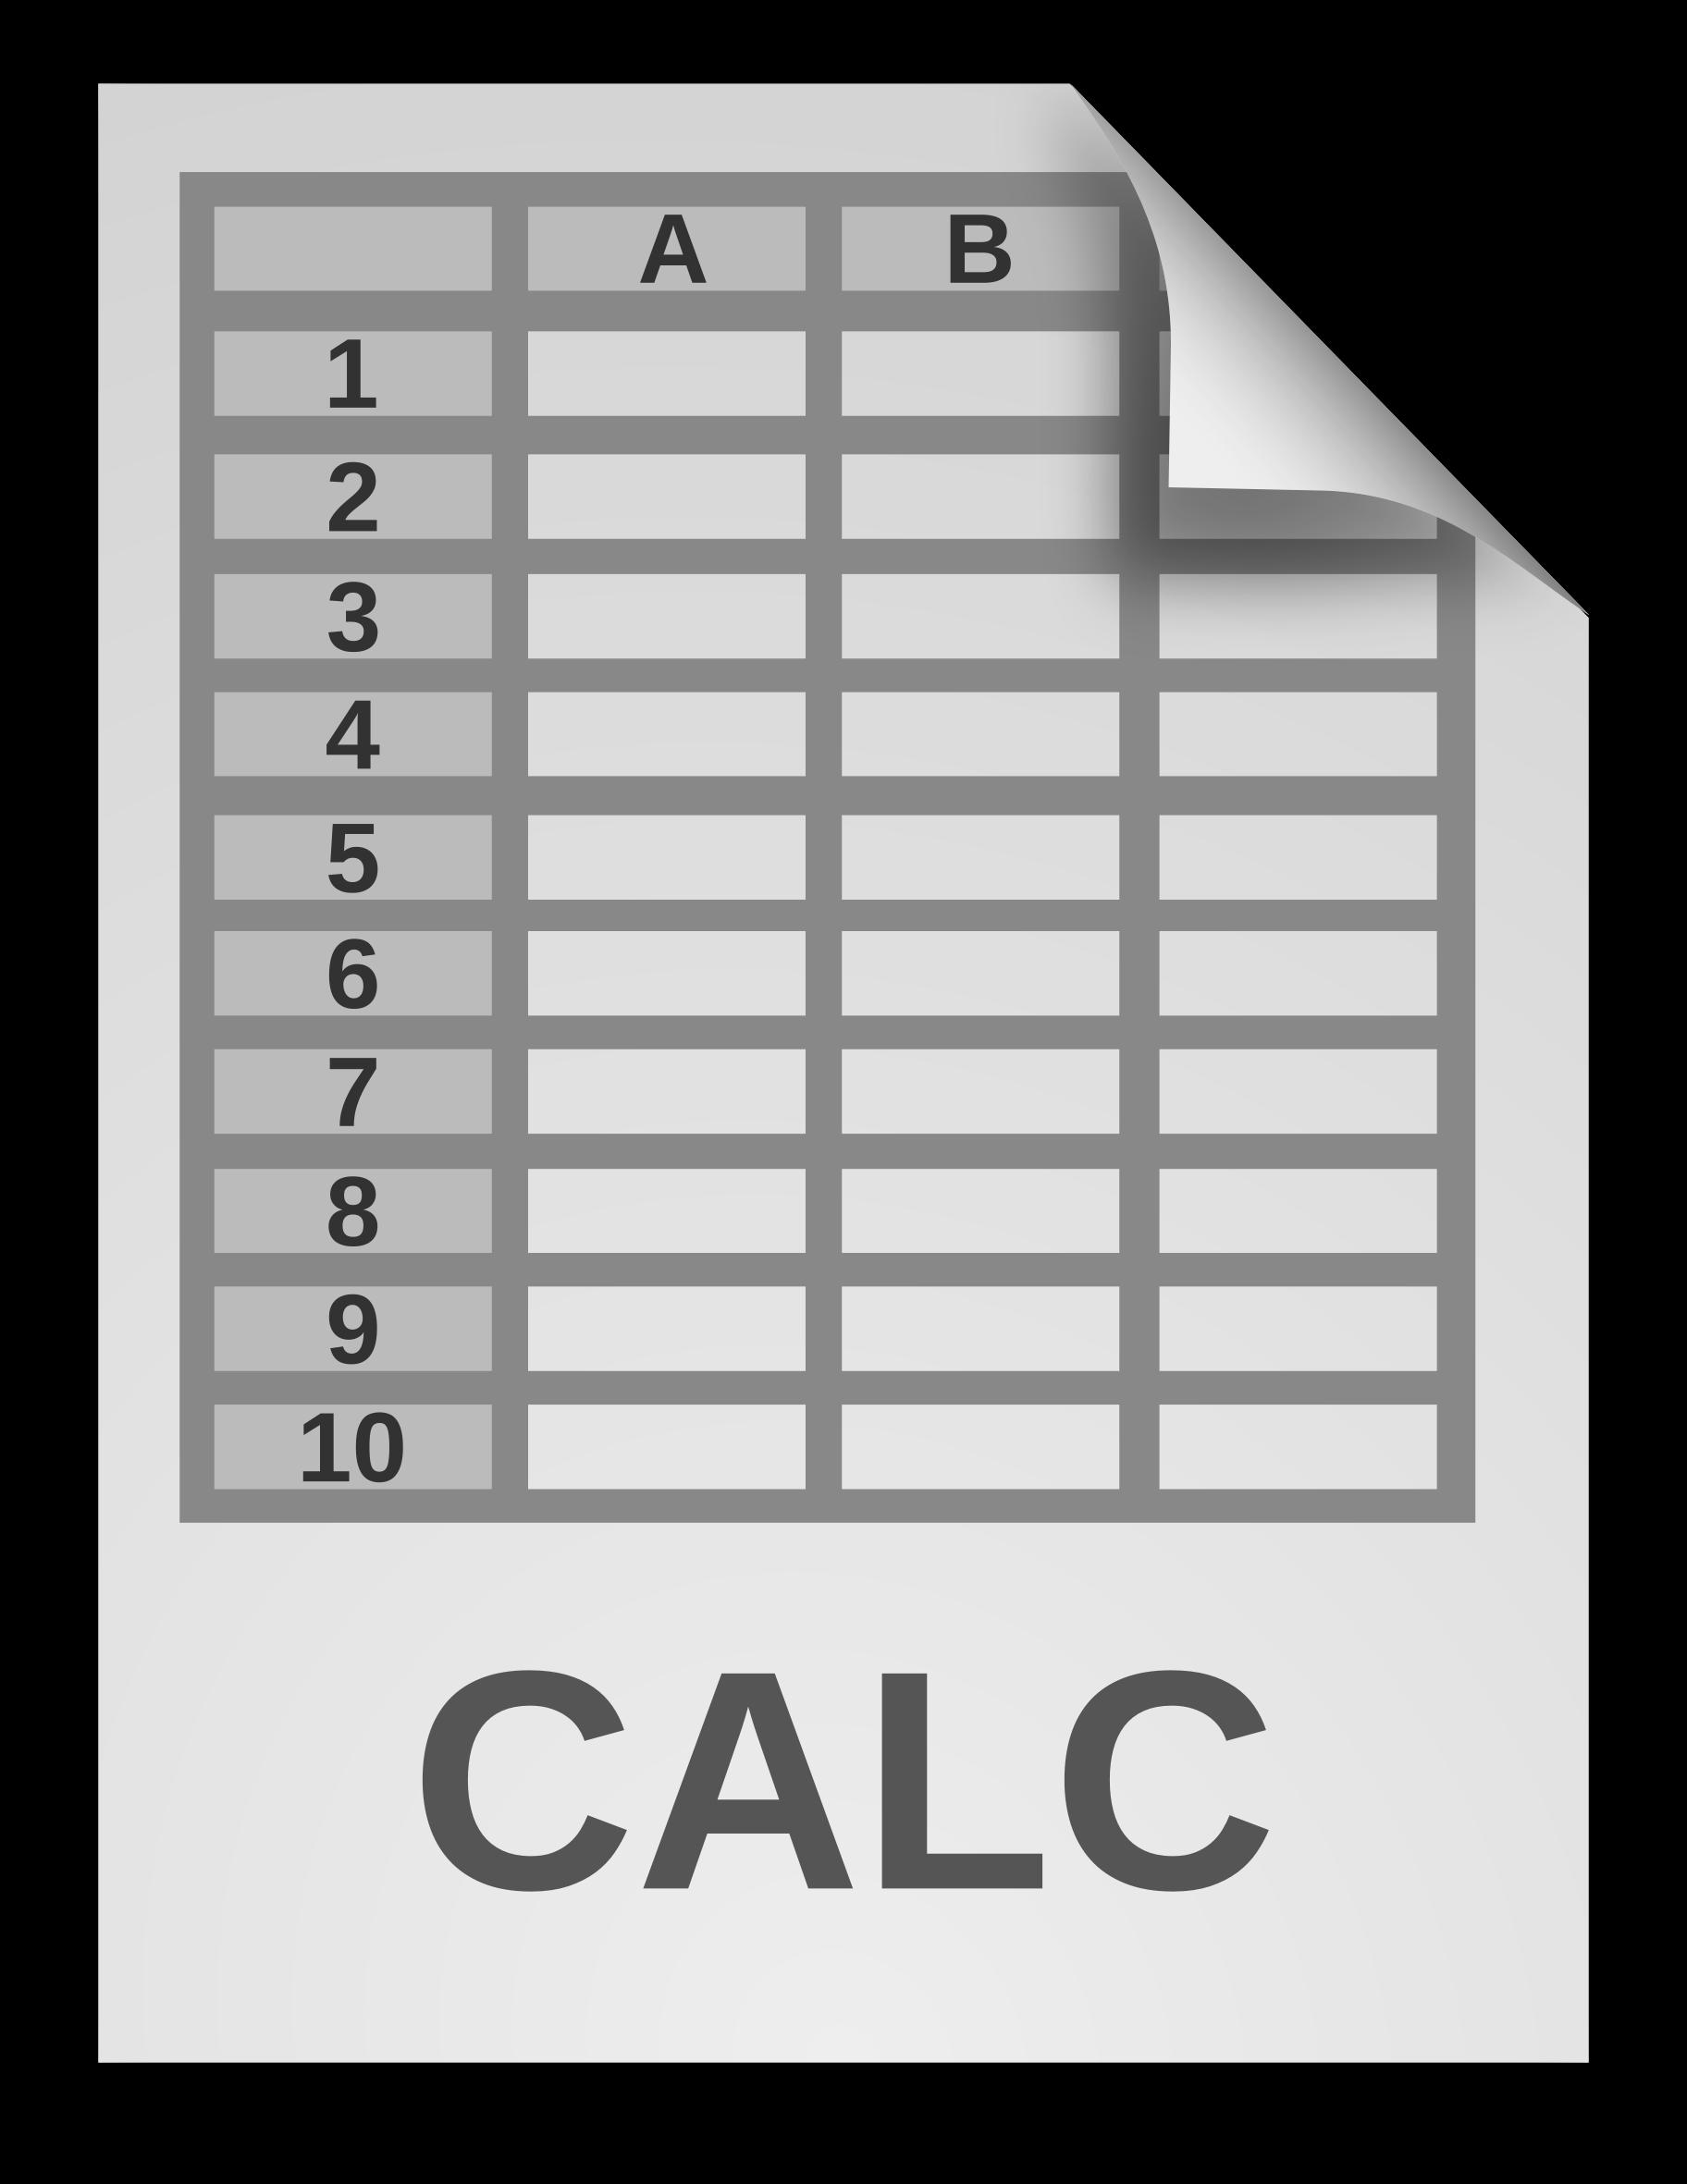 Document clipart generic. Spreadsheet icon big image